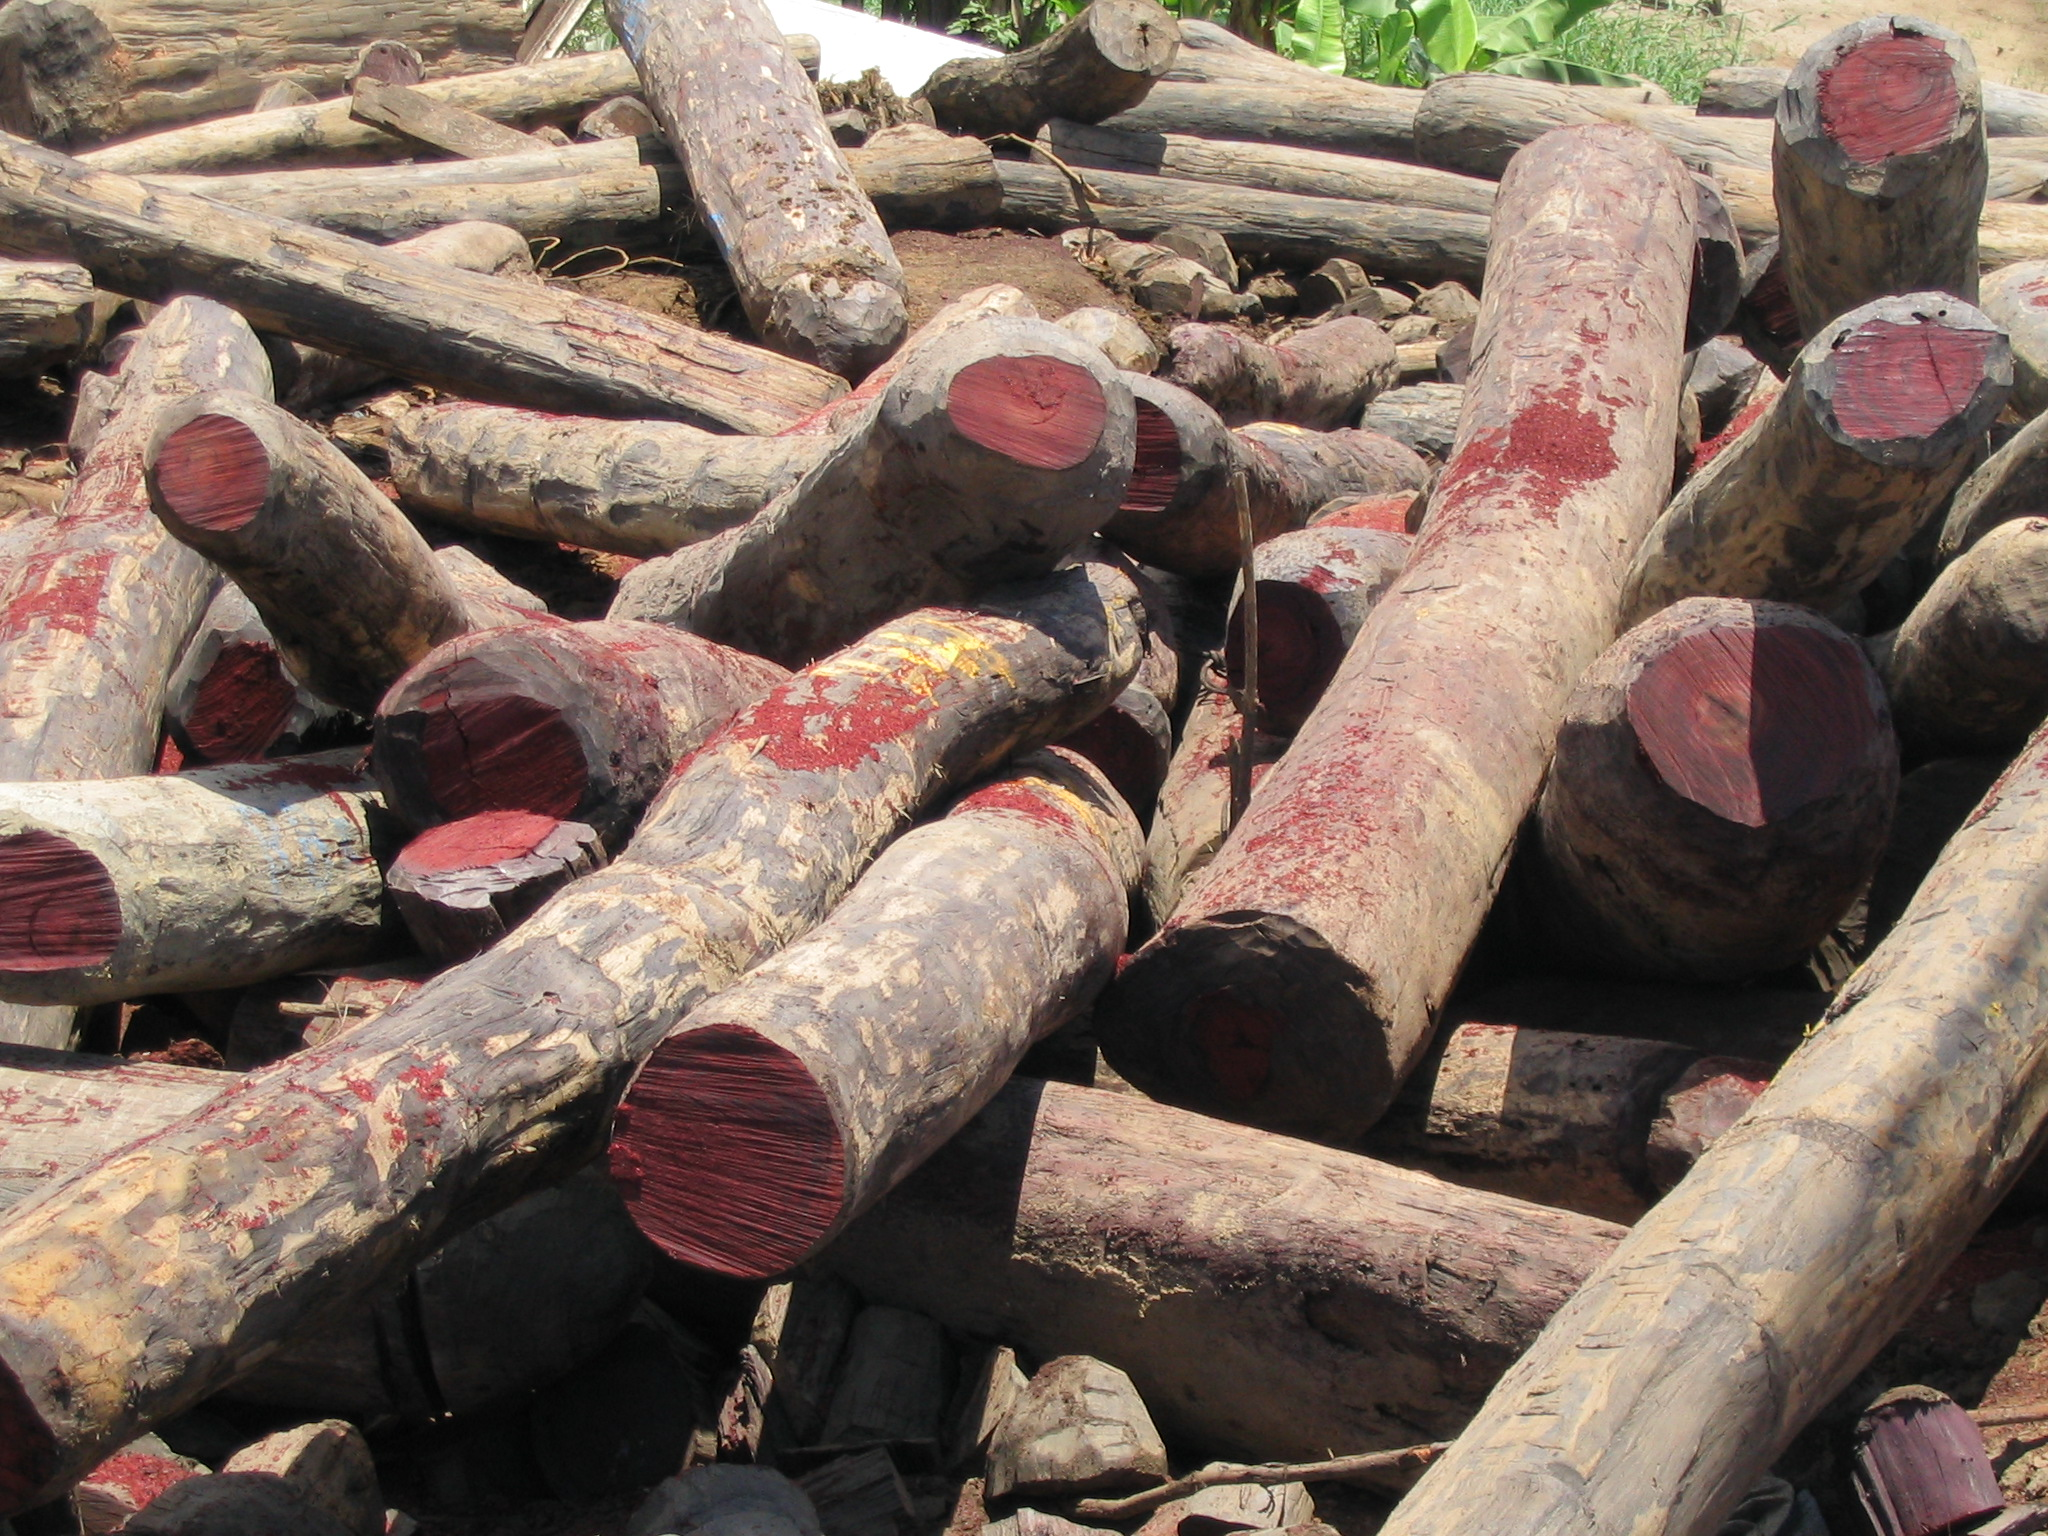 Illegal_rosewood_stockpiles_001.jpg